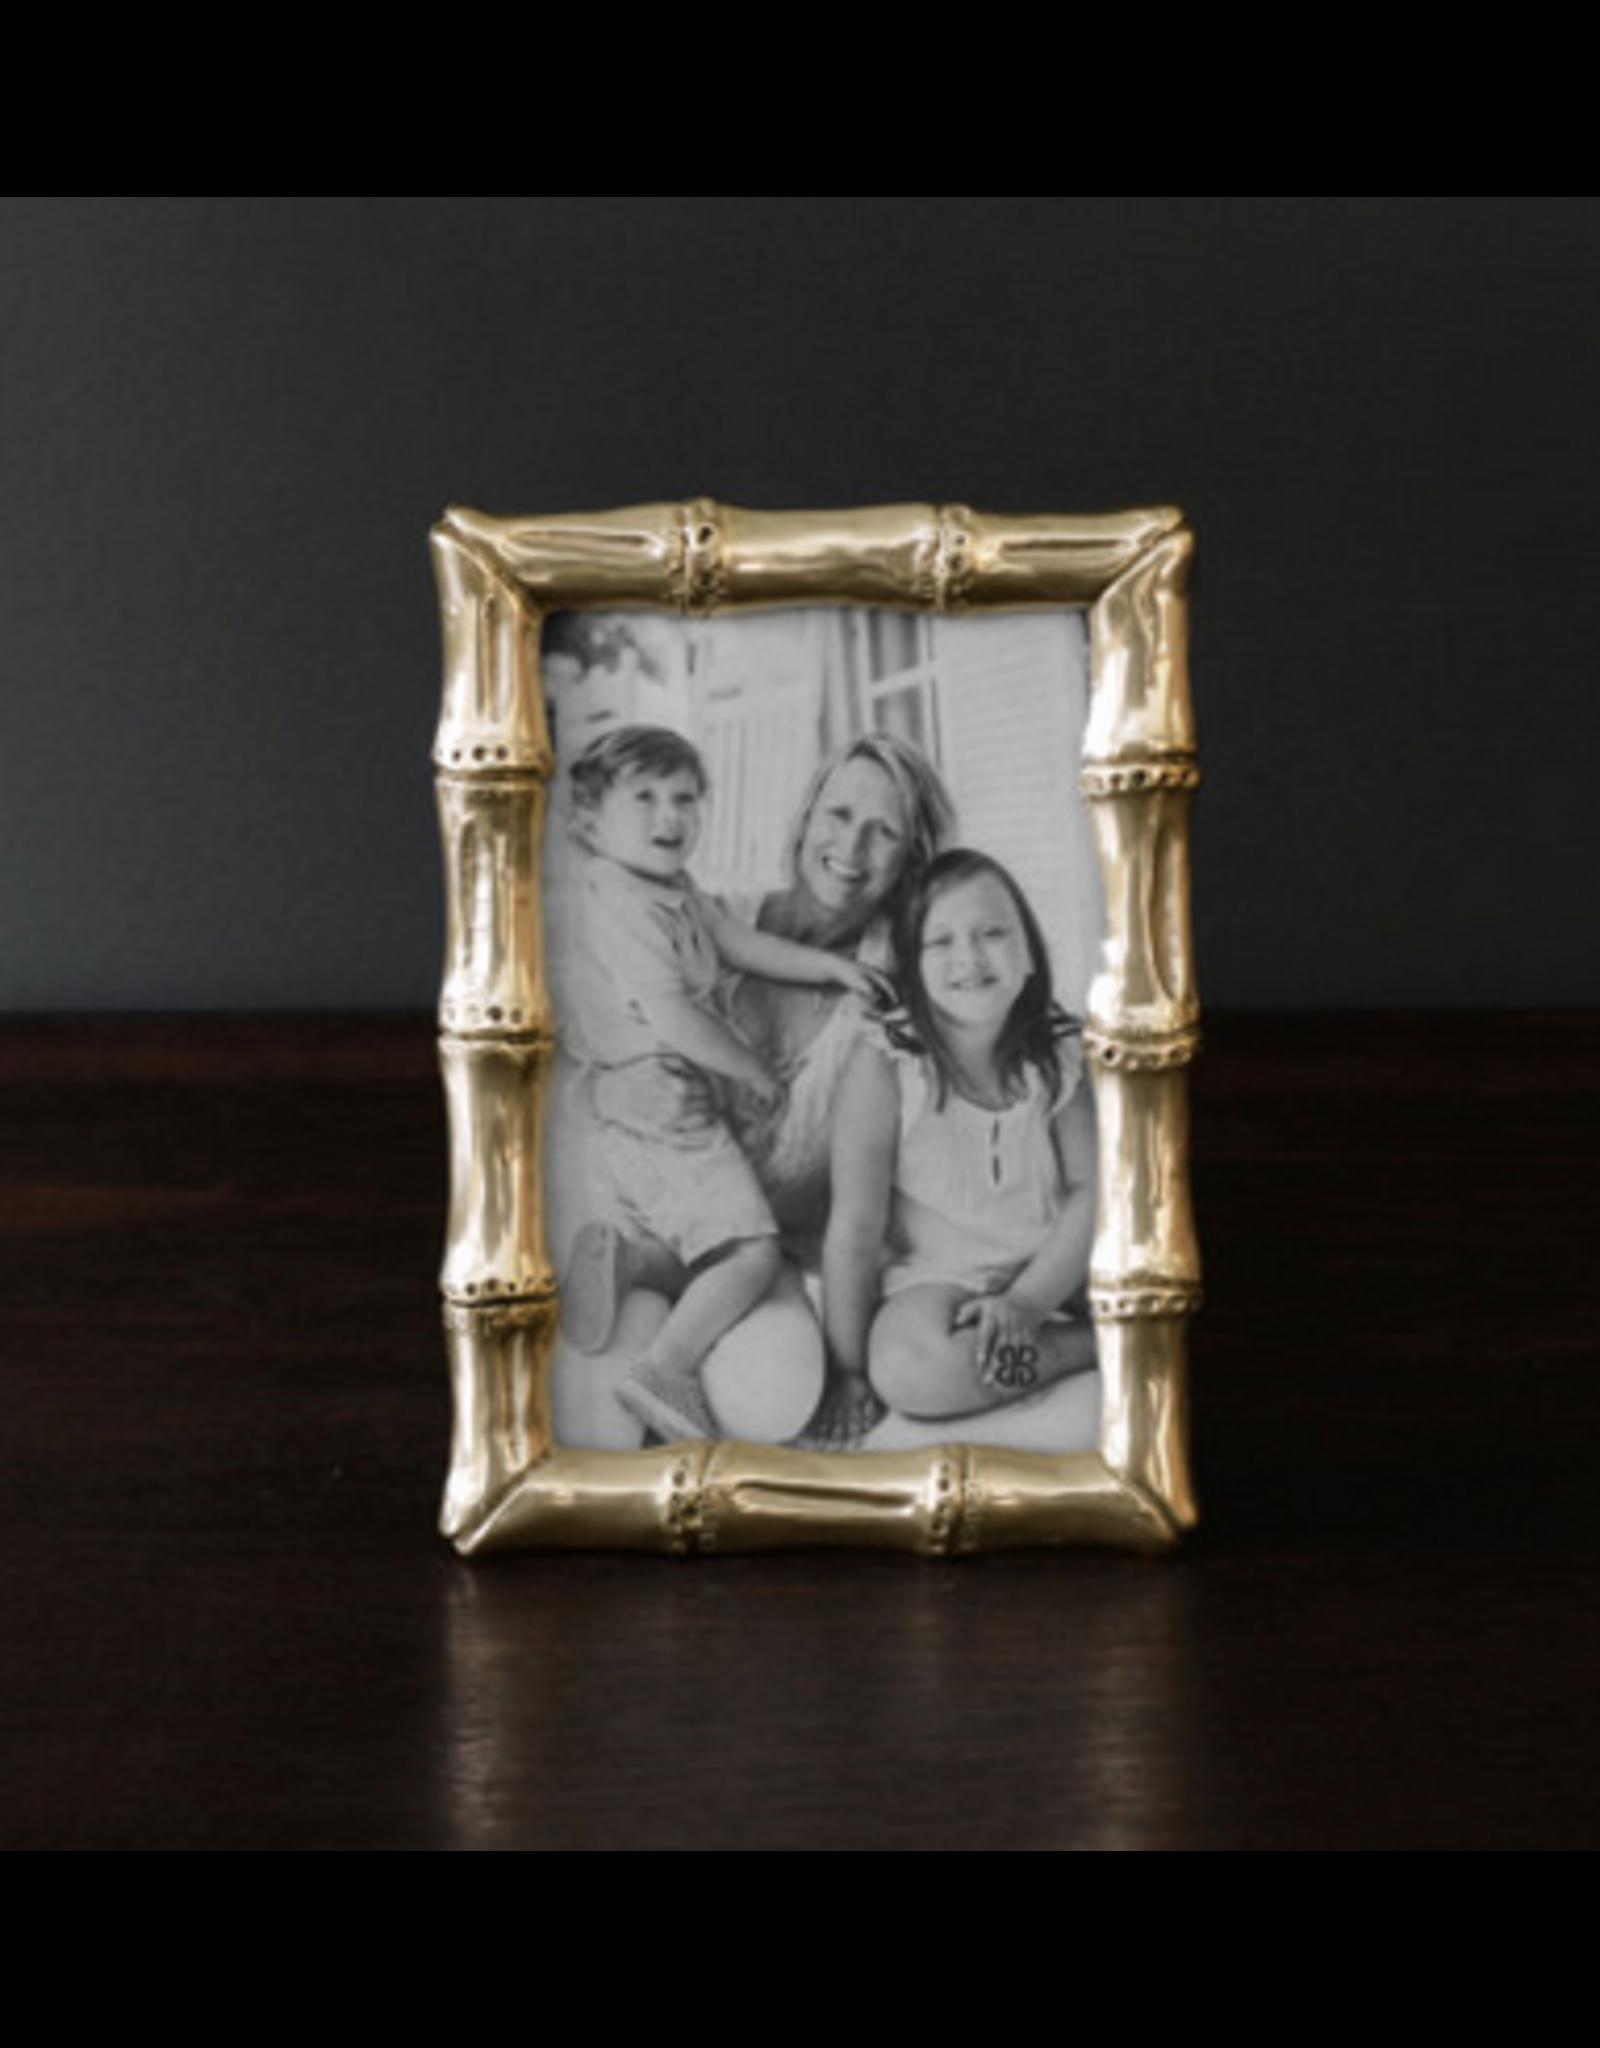 Beatriz Ball Sierra Bamboo Frame Gold 4x6